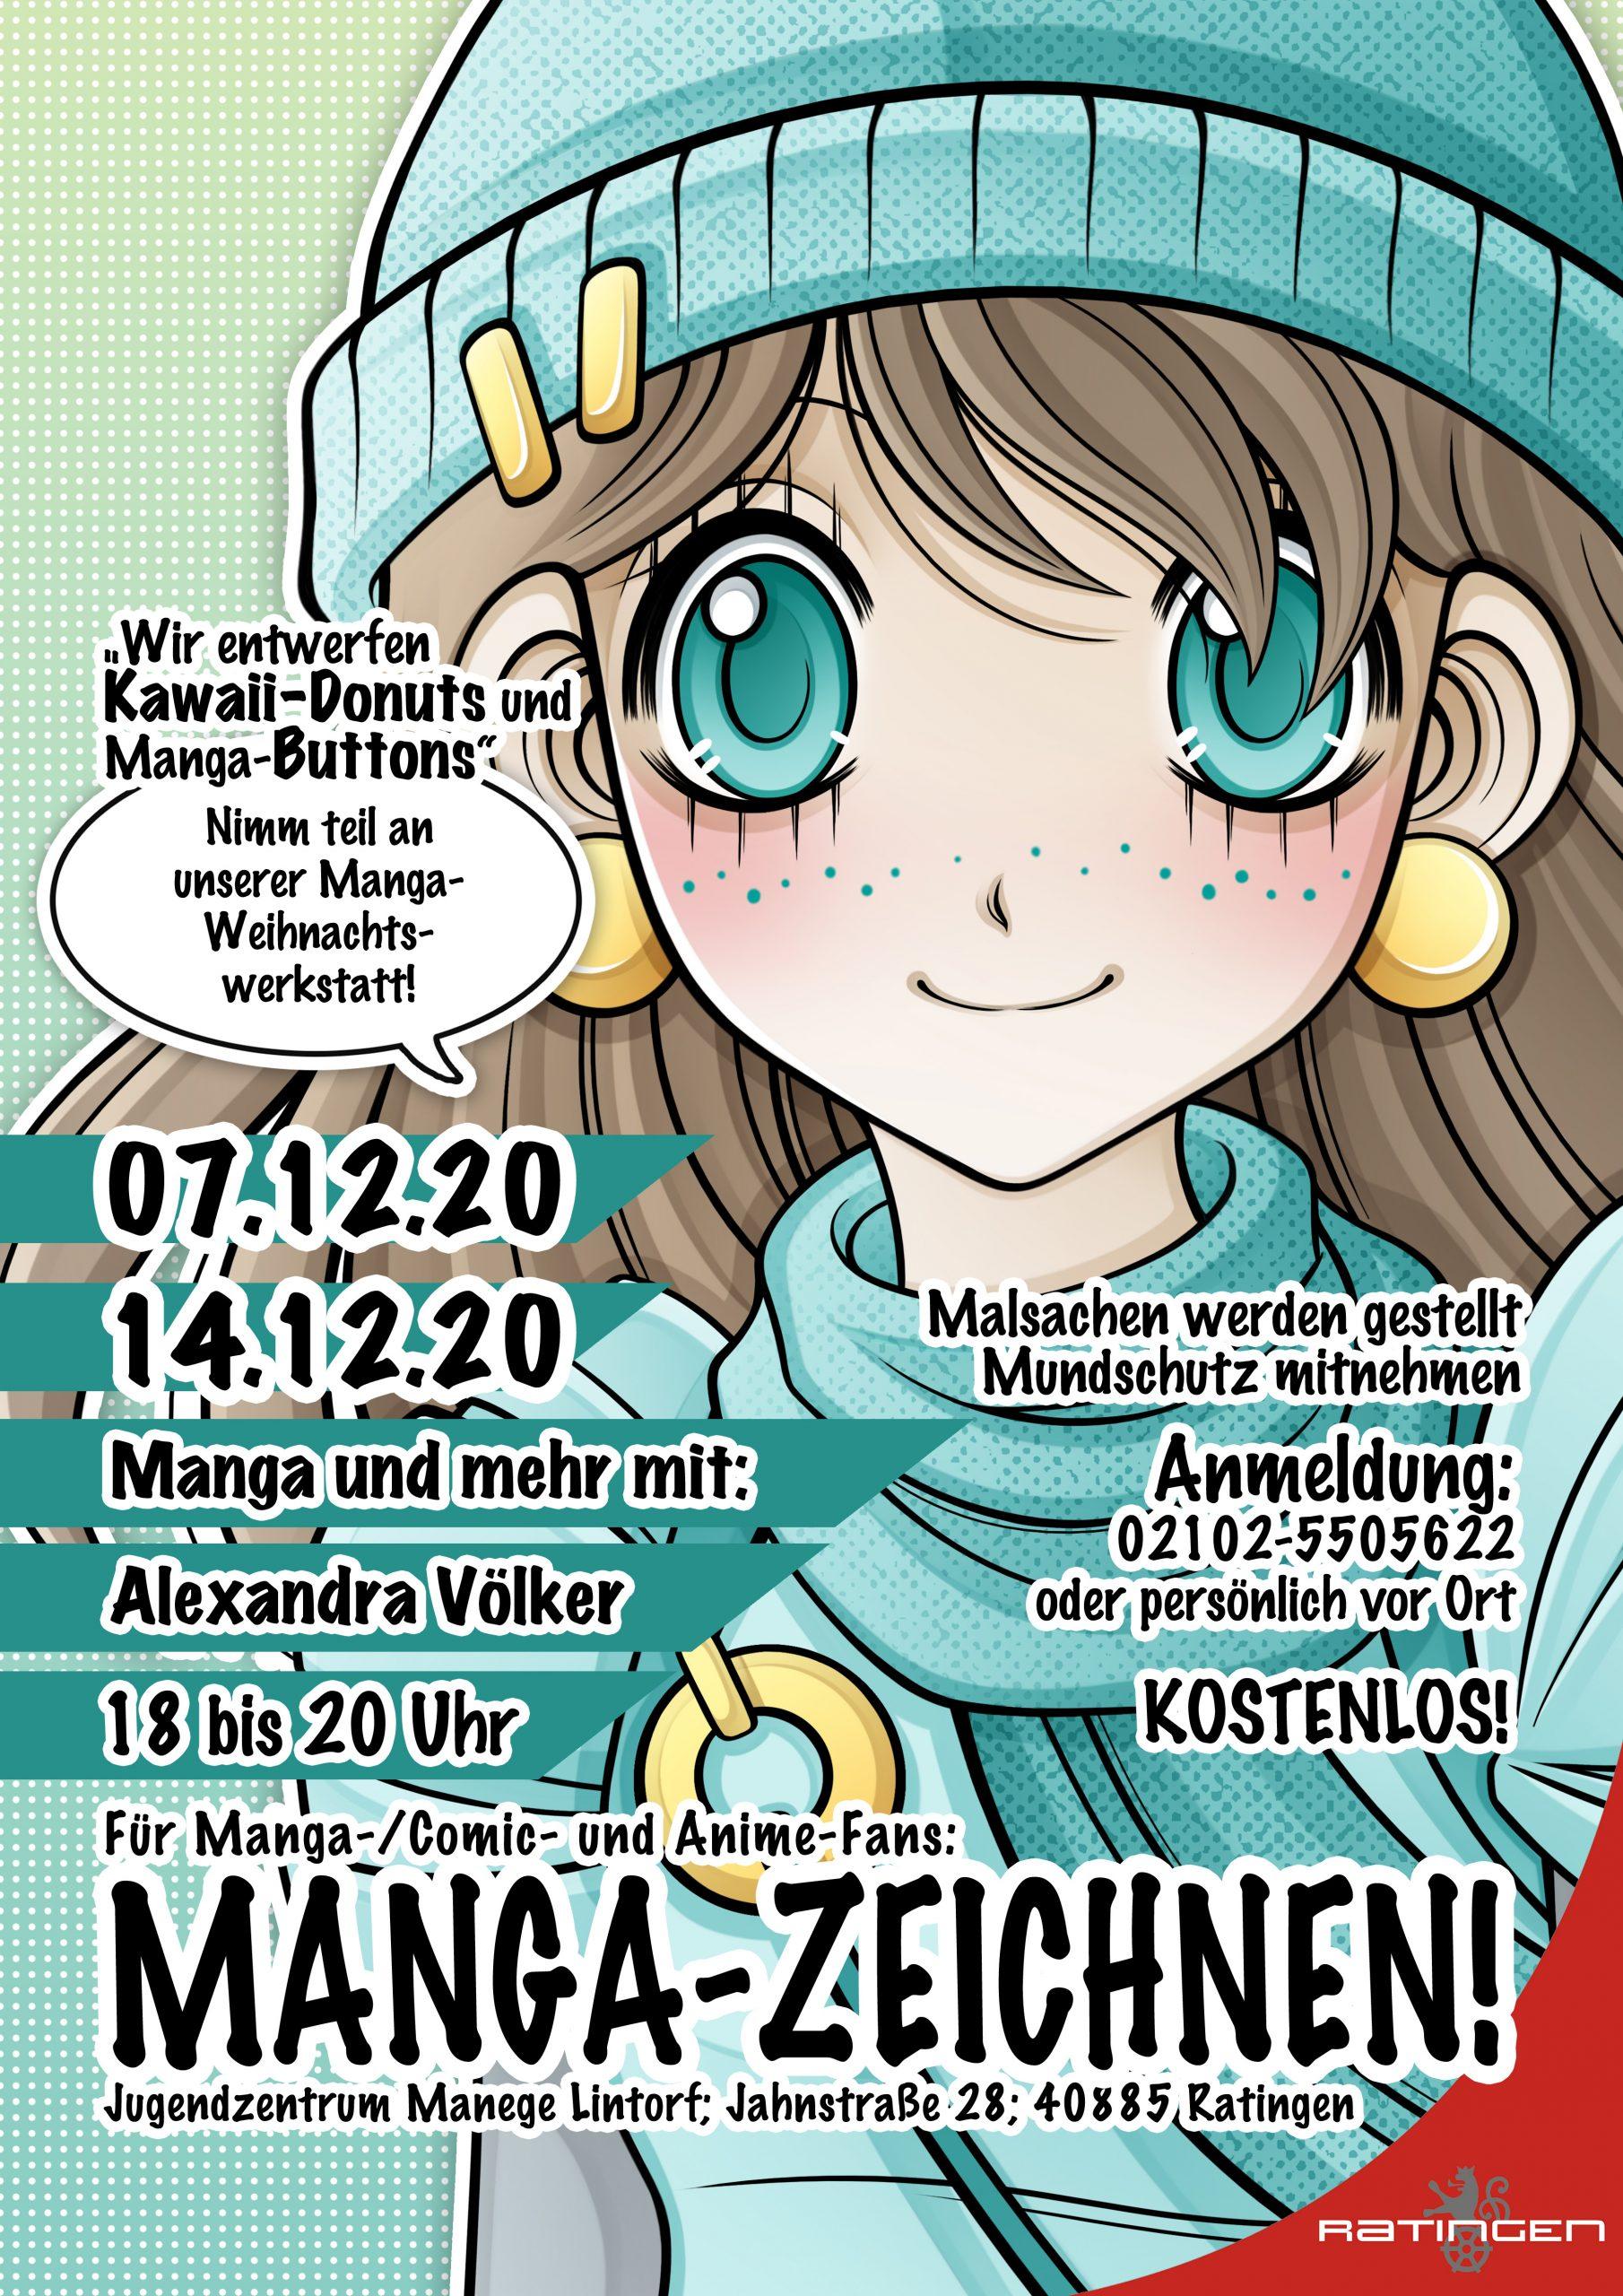 jugendkulturjahr-2020-ratingen-jkj-2020-manga-manege